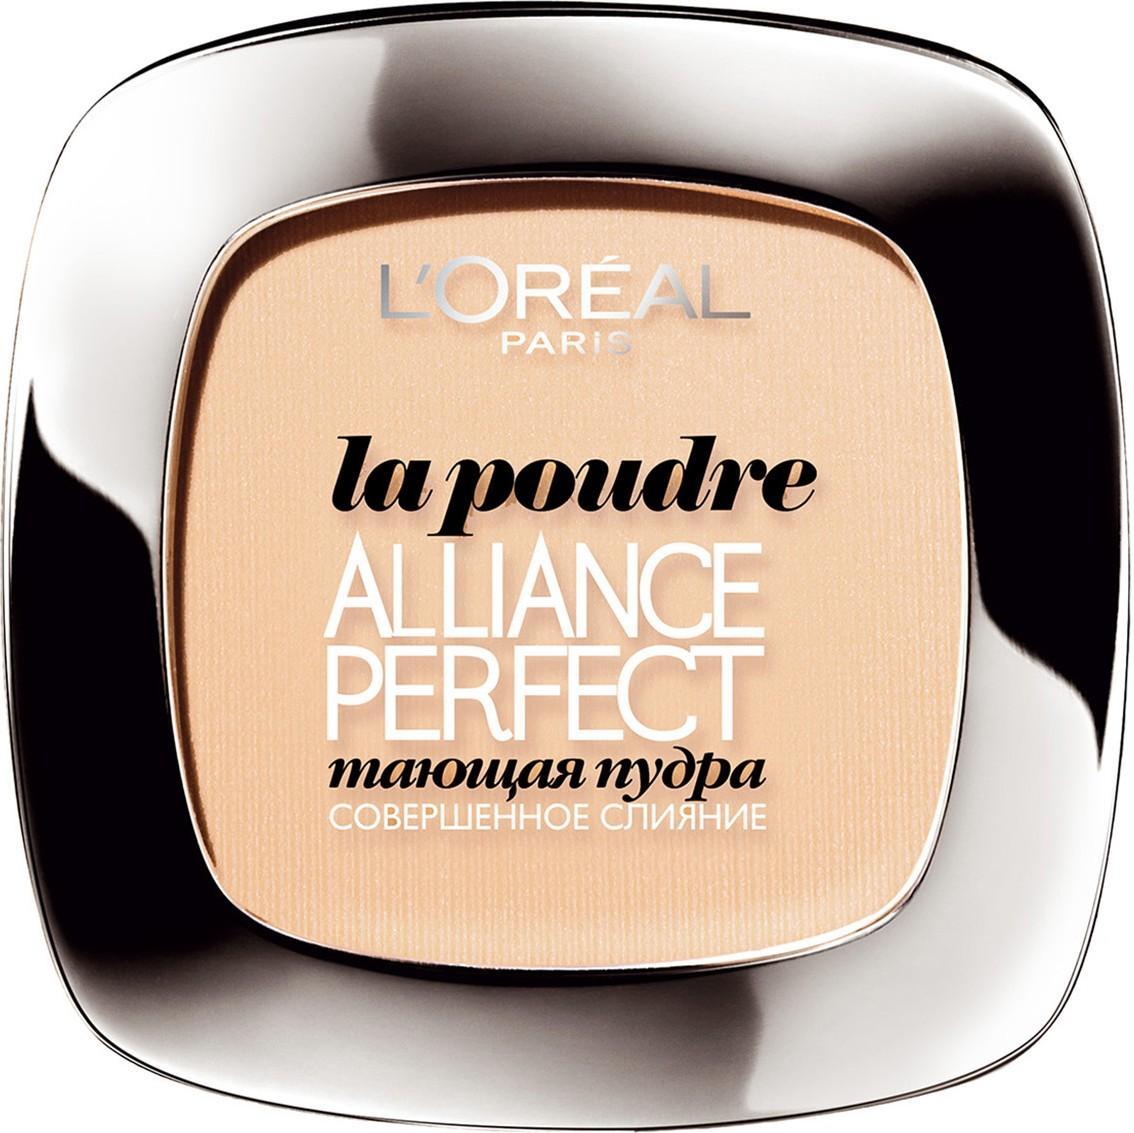 Пудра компактная L'Oreal Paris Alliance Perfect тон 2 R